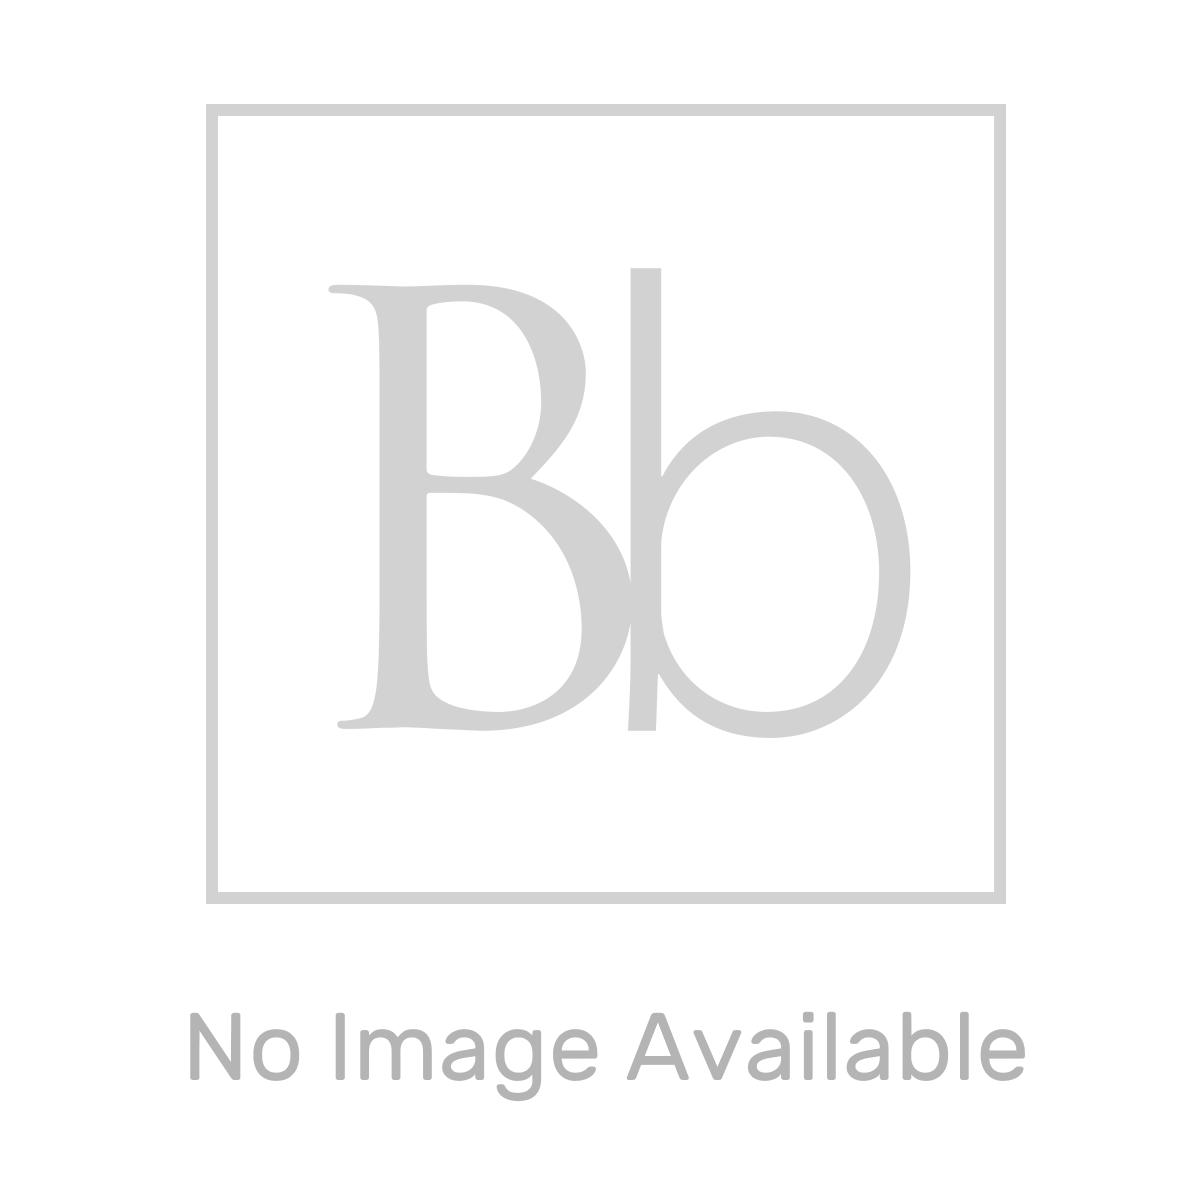 RAK Surface Cool Grey Lappato Tile 600 x 600mm Lifestyle